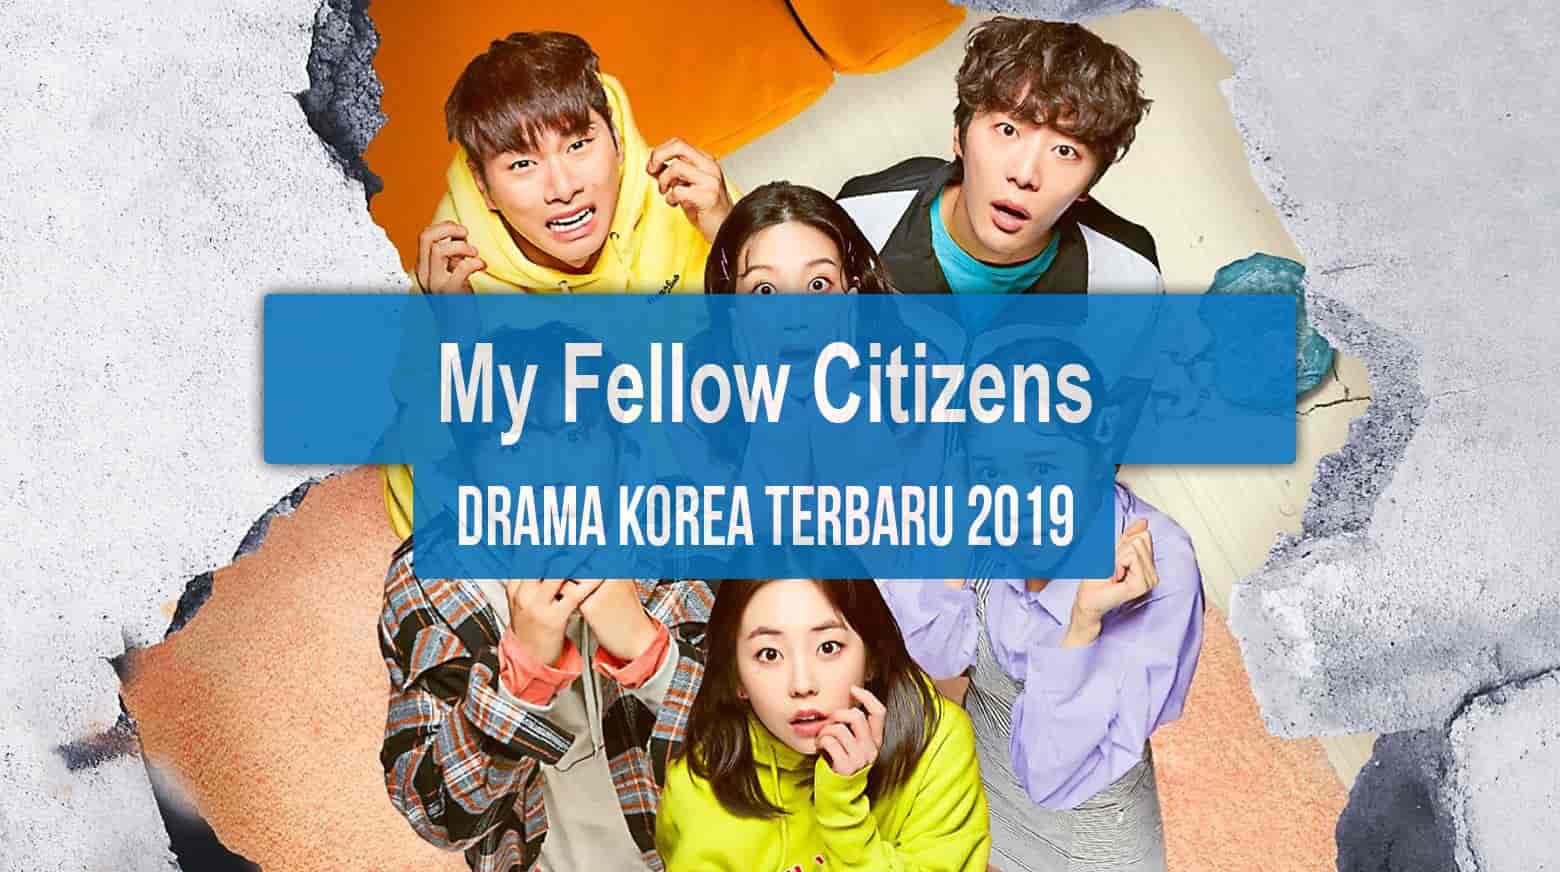 Sinopsis Tanggal Rilis Jadwal Drama Korea My Fellow Citizens! Bahasa Indonesia